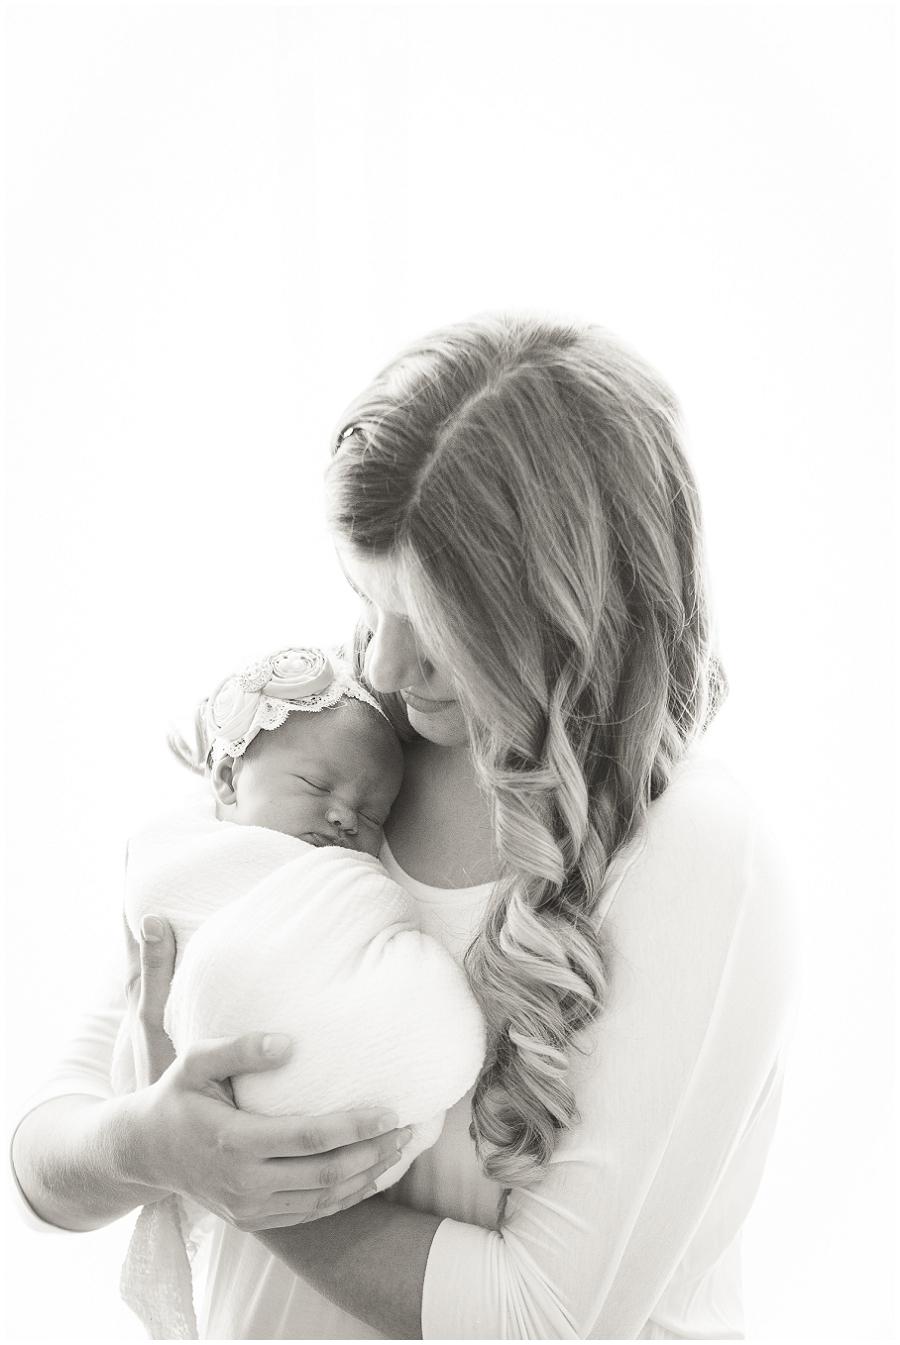 Albany  Newborn Photographer-1.jpg